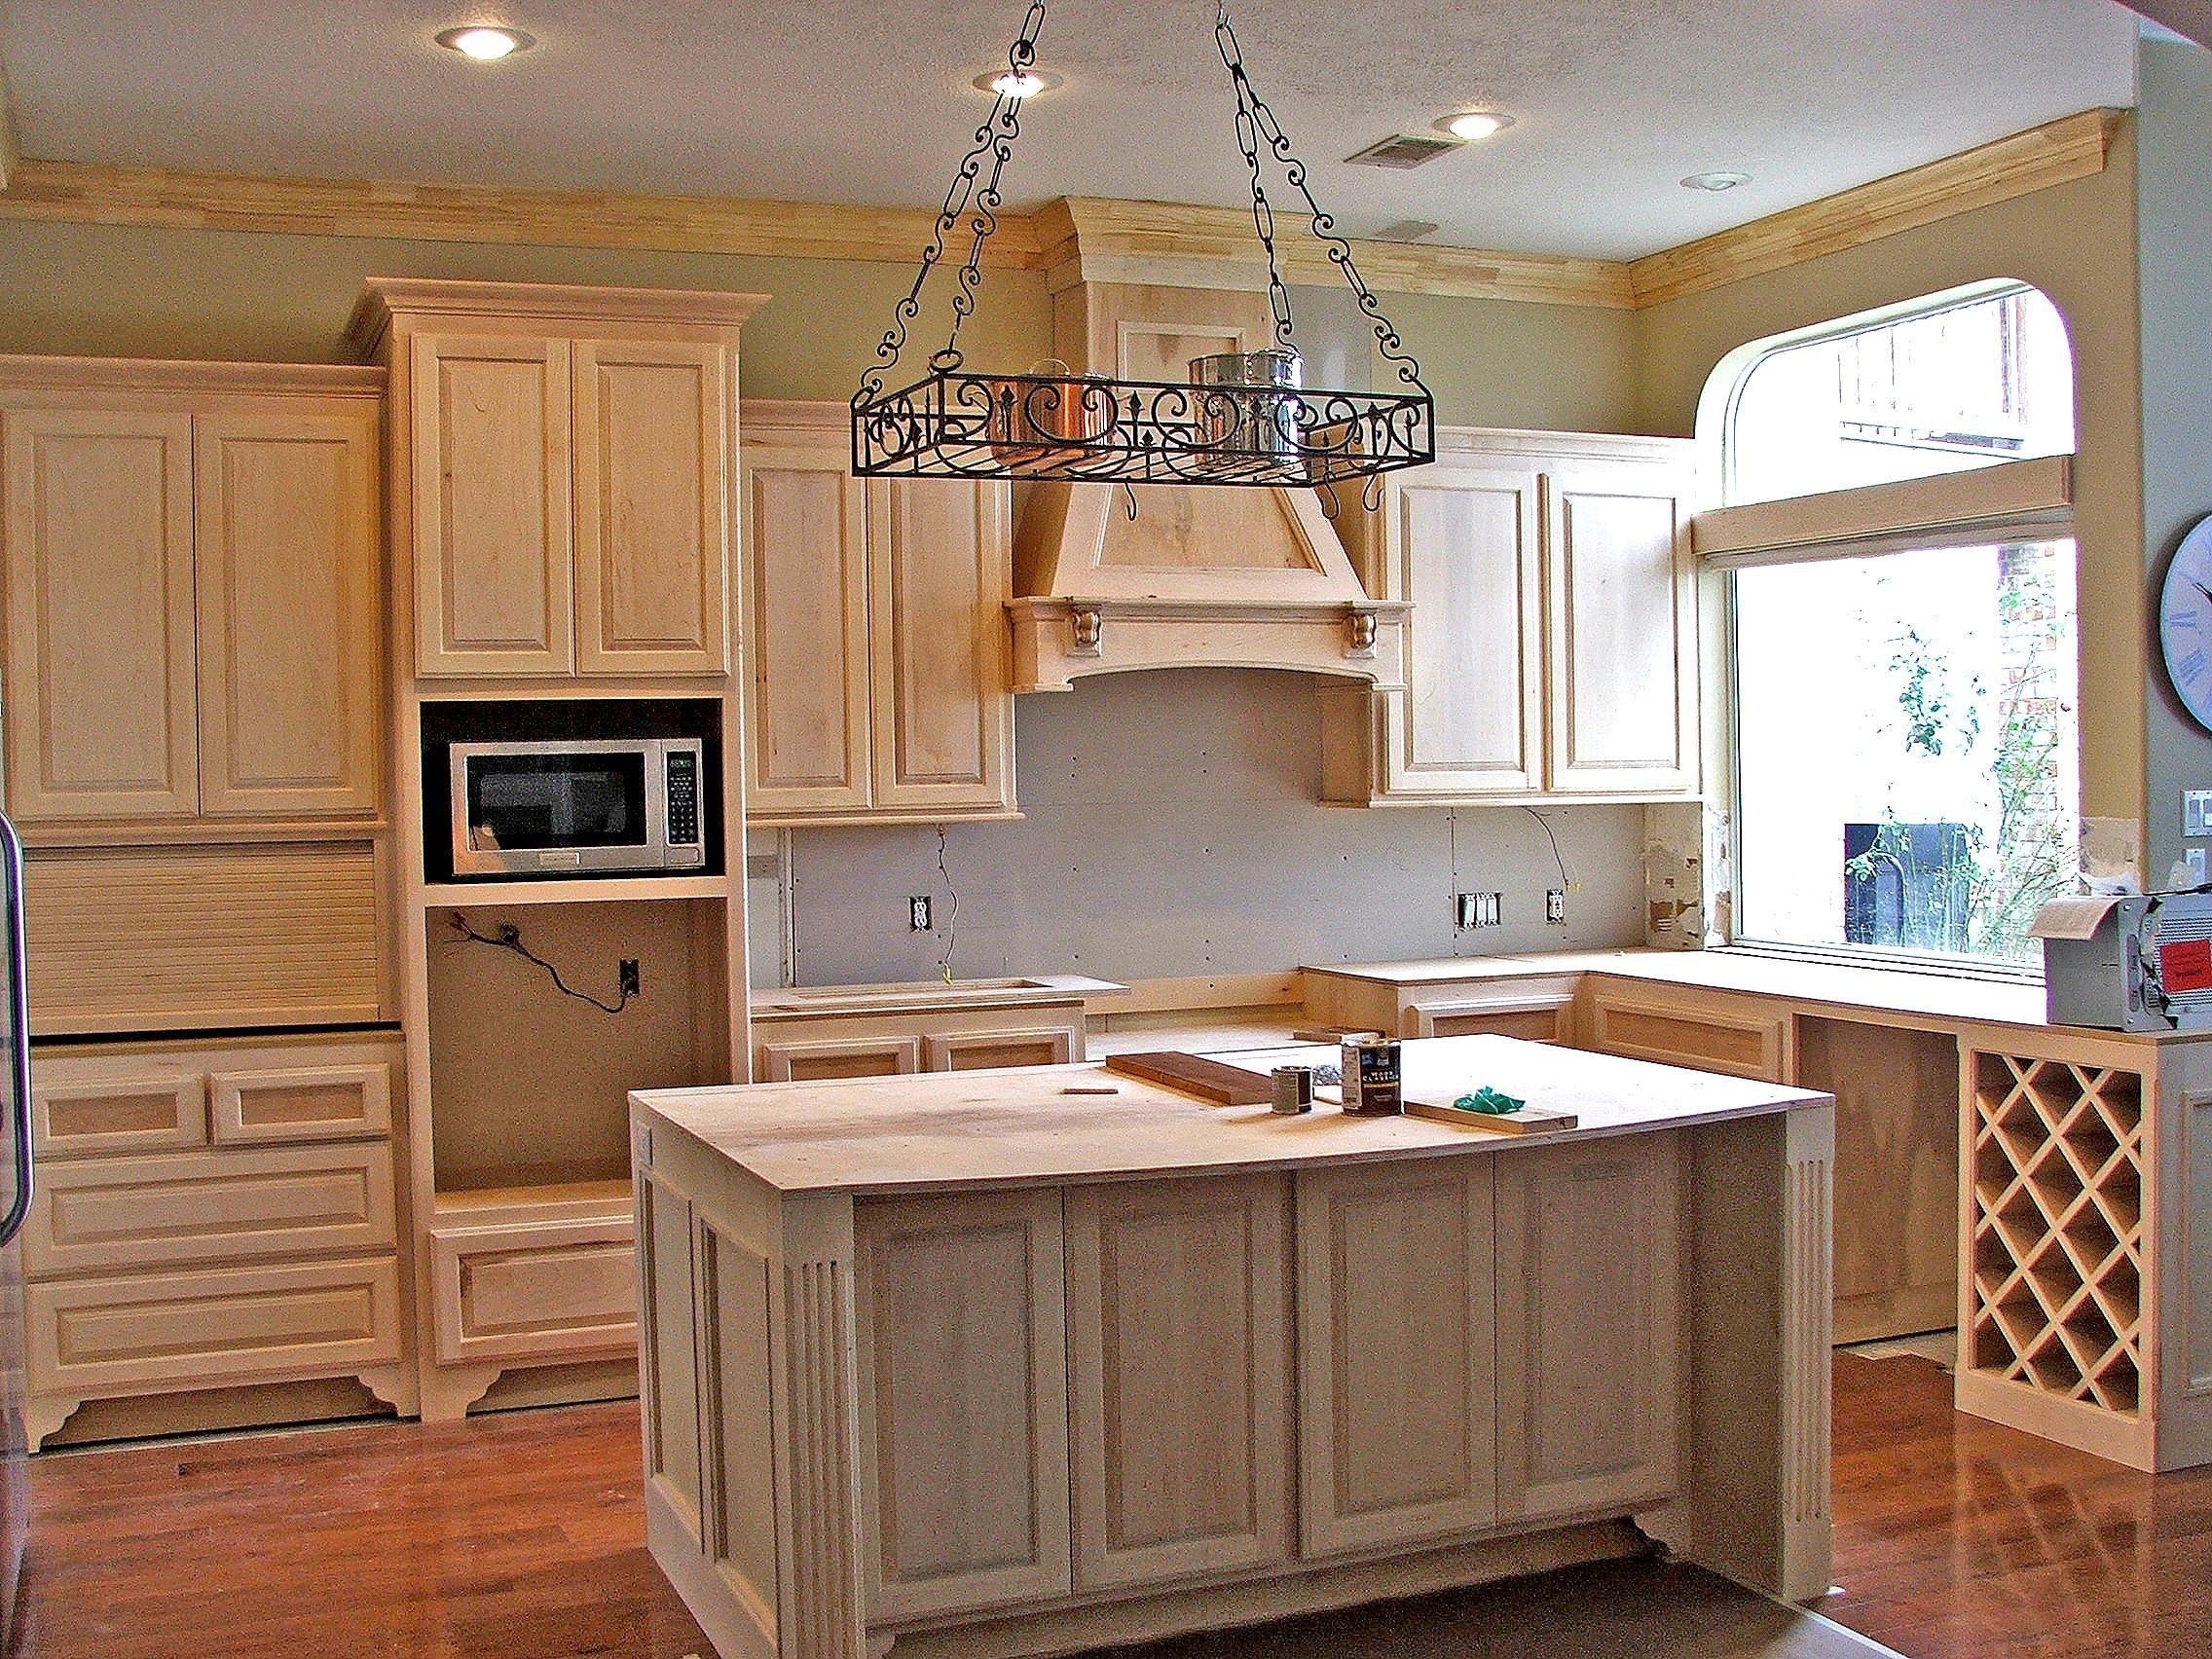 elegant light wood grain kitchen cabinets lightwoodlandcap lightwood300 lightwoodalbright on kitchen cabinets light wood id=38669